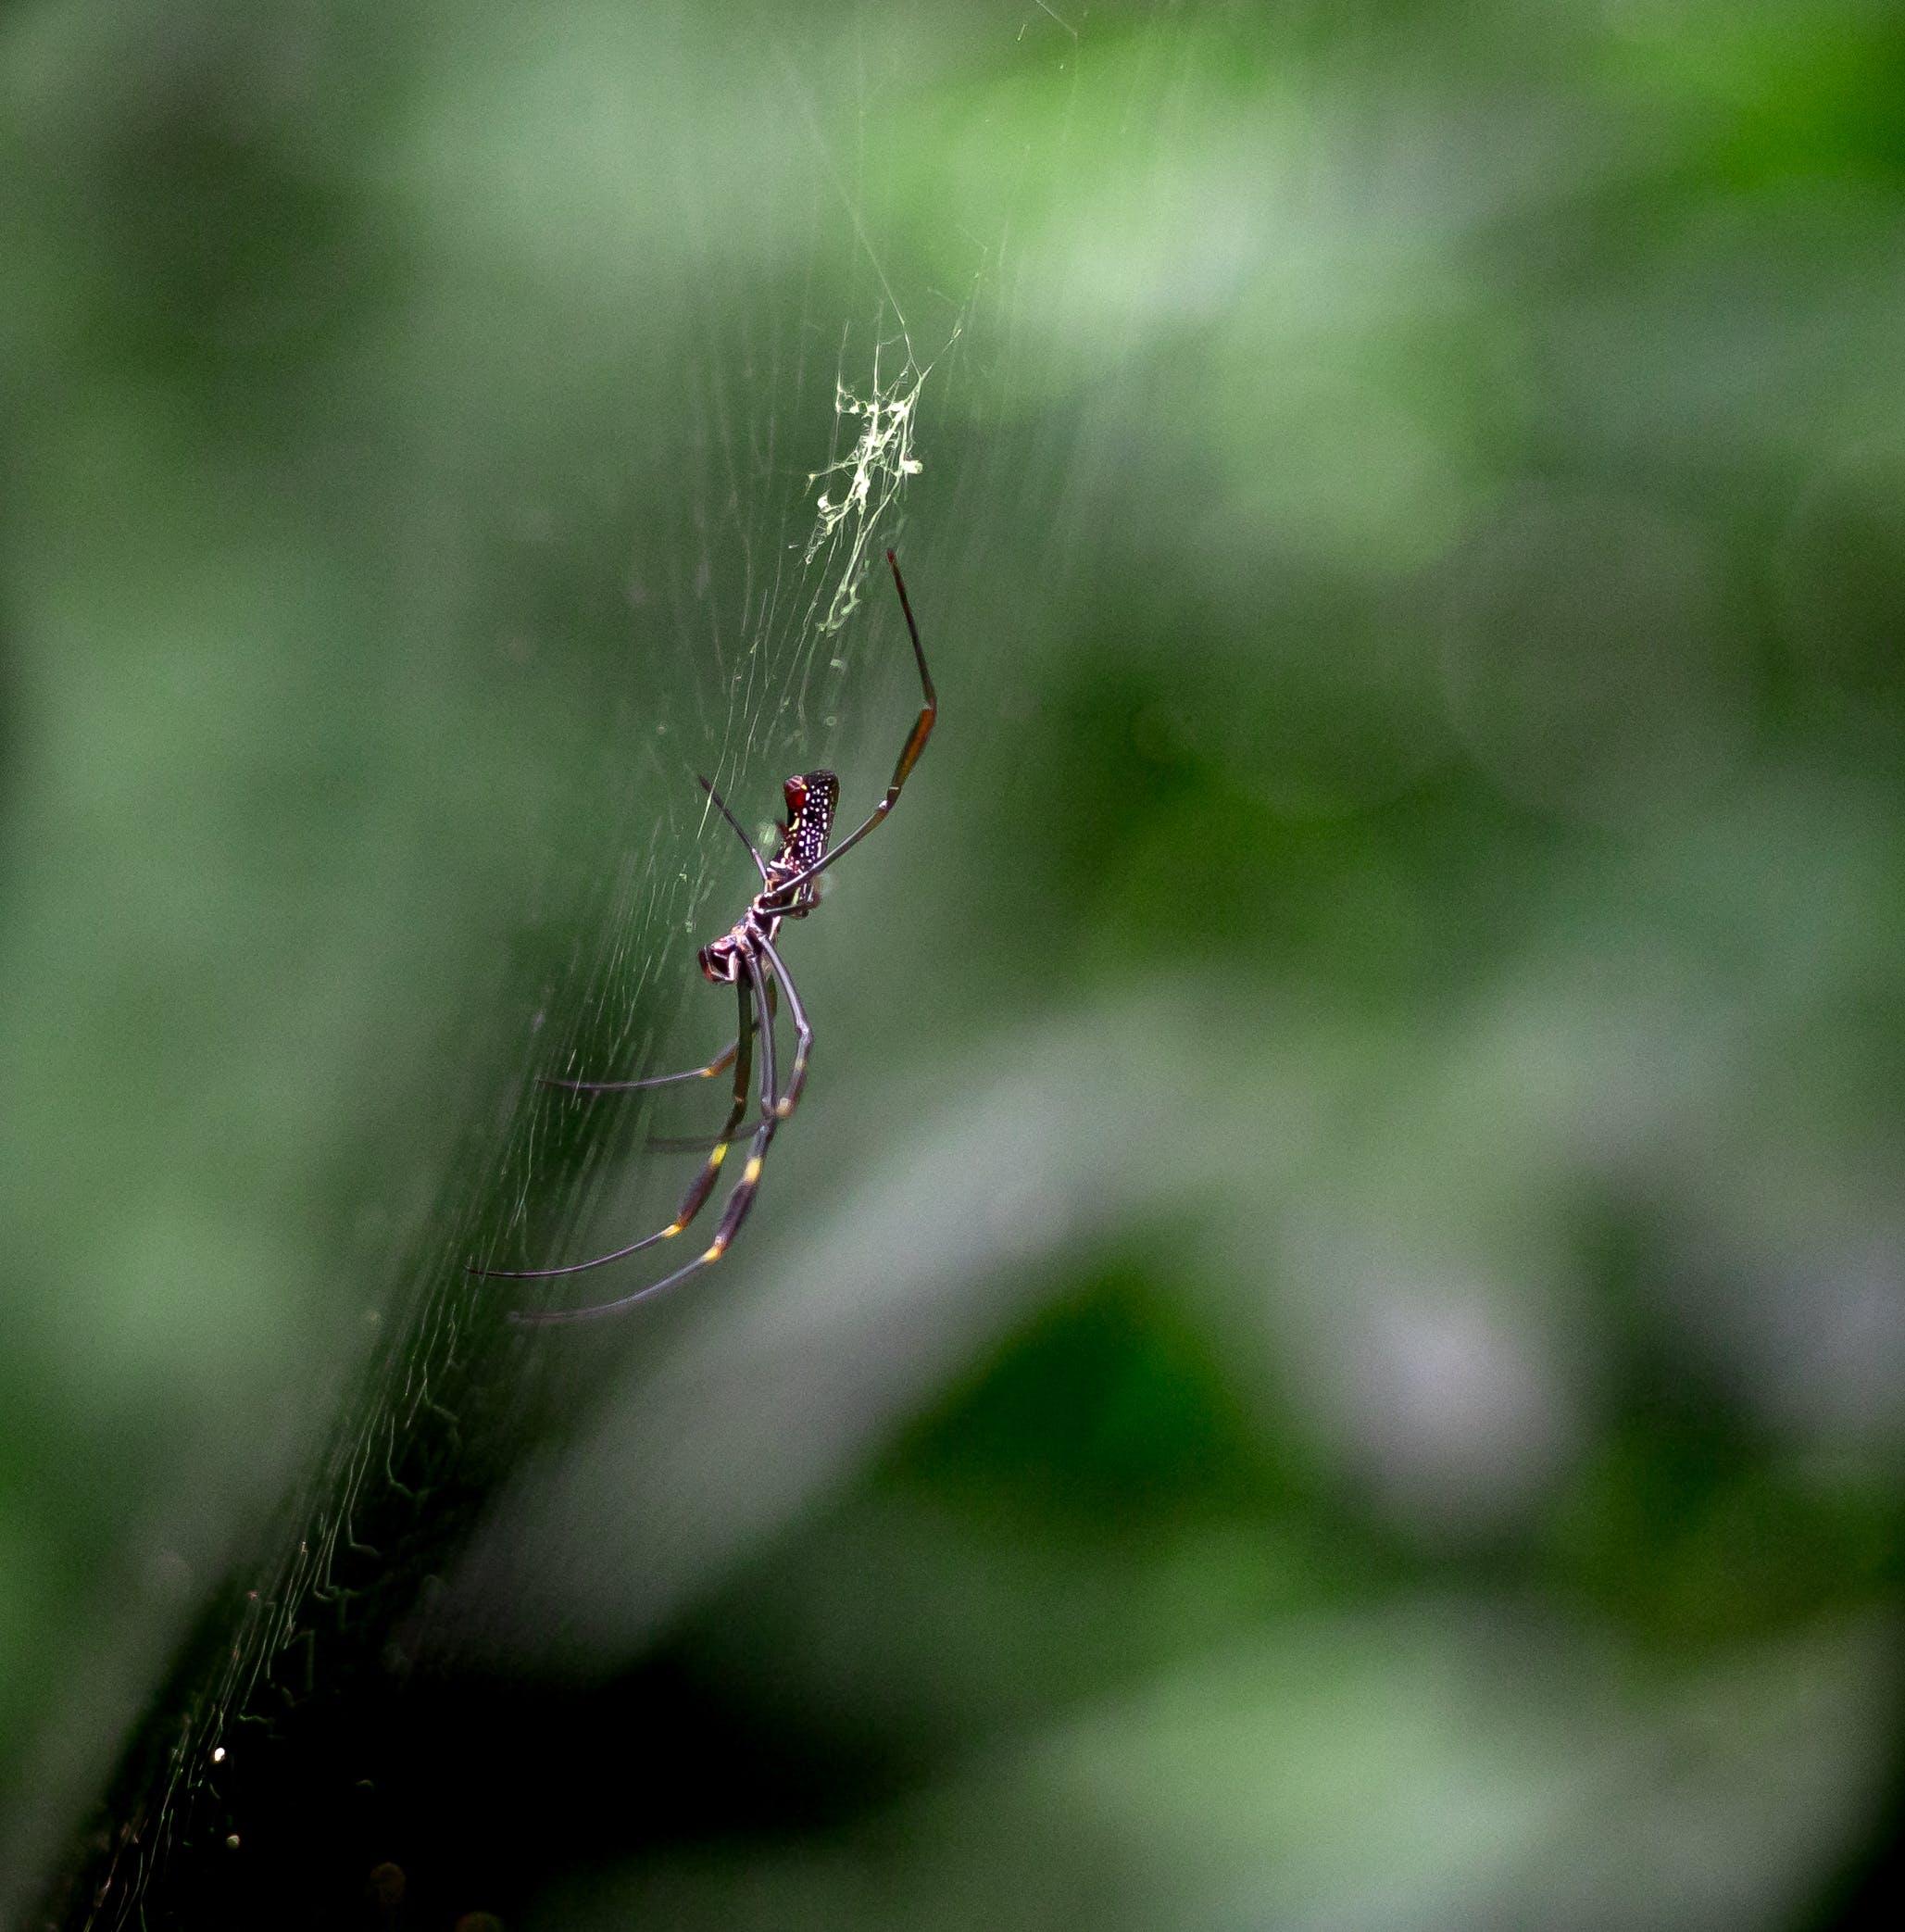 Free stock photo of animal, aranha, green, insect